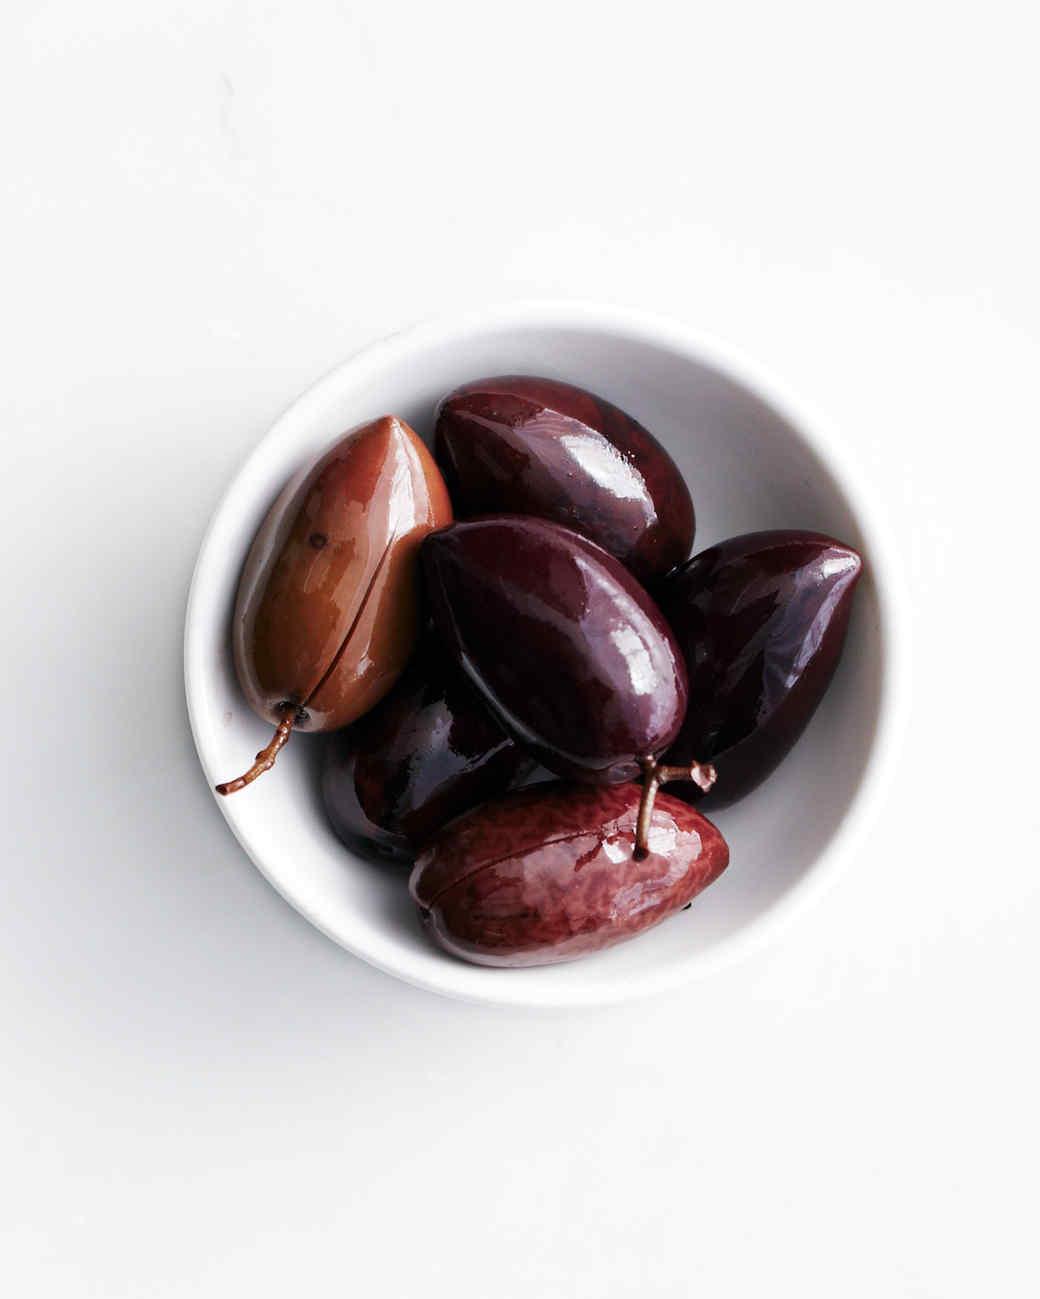 olive-ipad-kalamata-0091-ld110630-0614.jpg